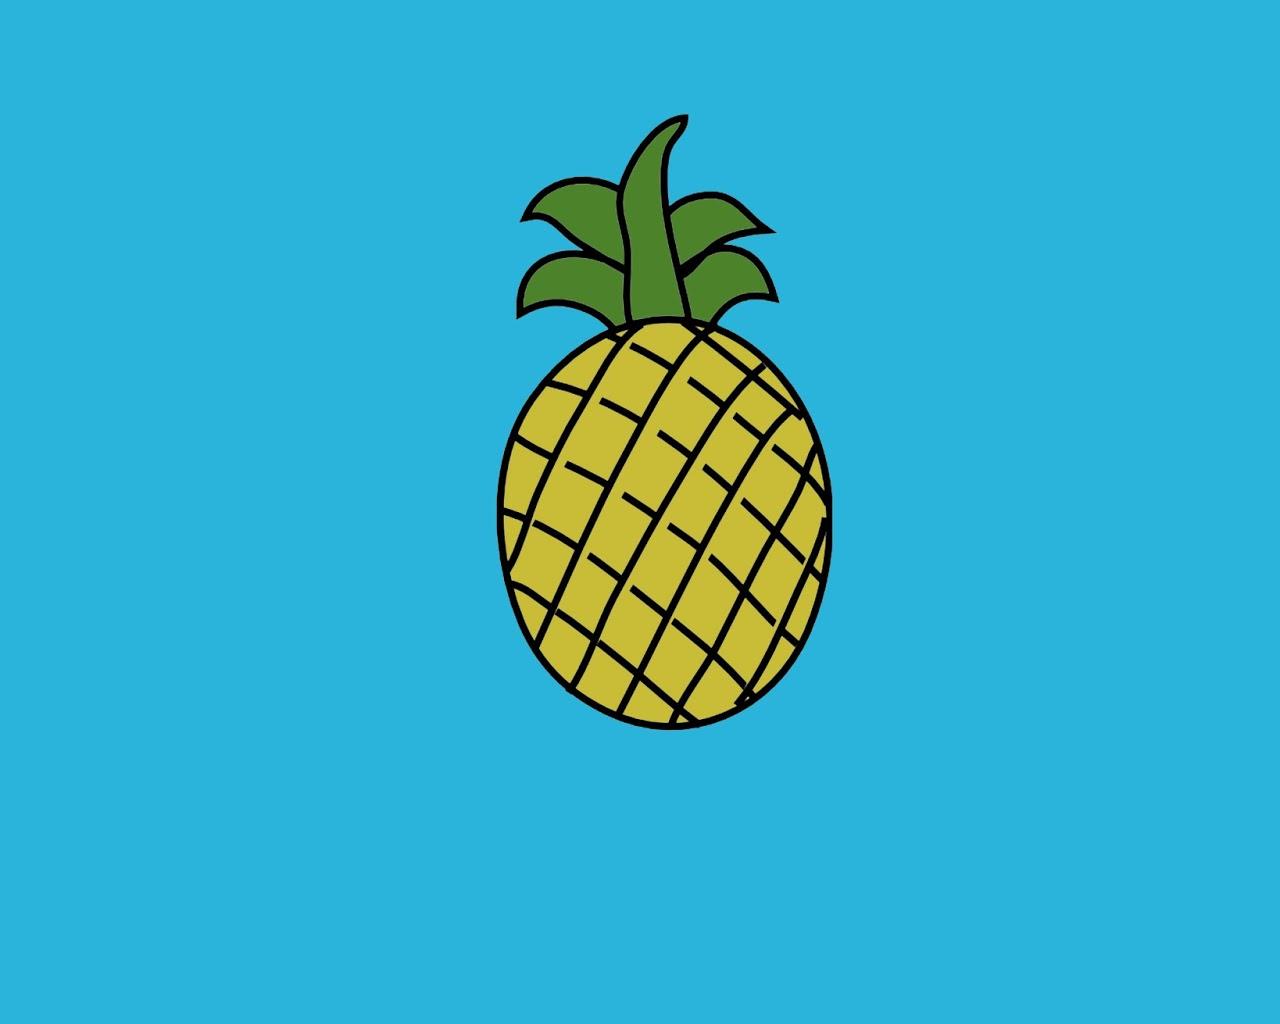 Free Download Pineapple Express Wallpaper Weddingdressincom